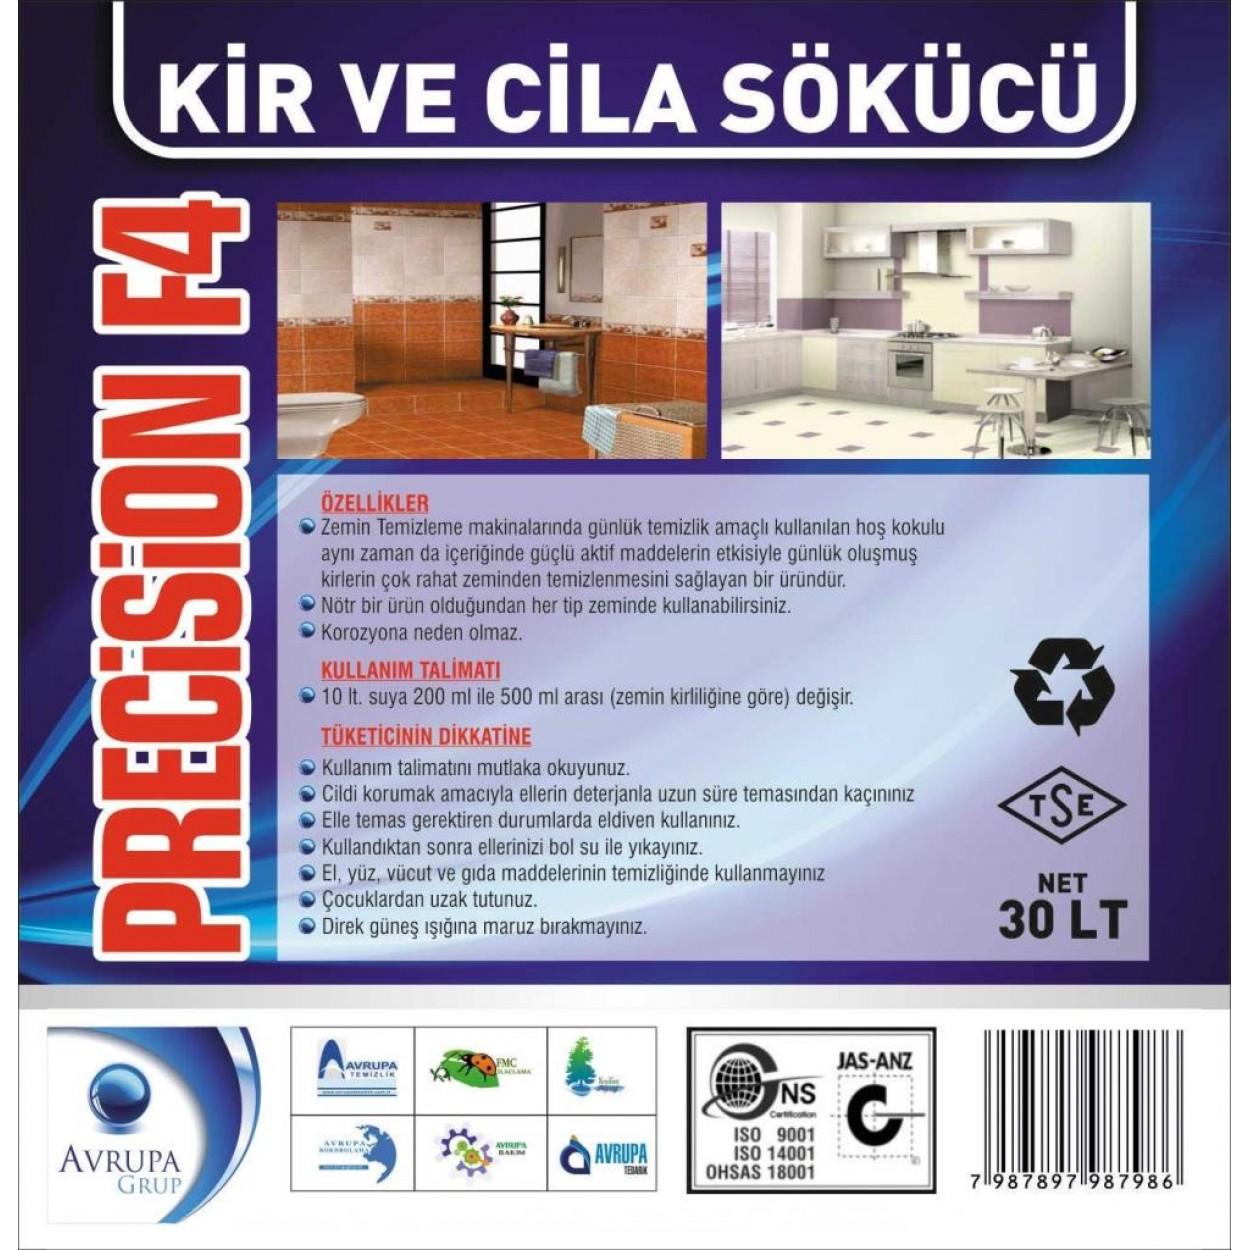 PRECİSİON F4 Kir ve Cila Sökücü 30 Litre